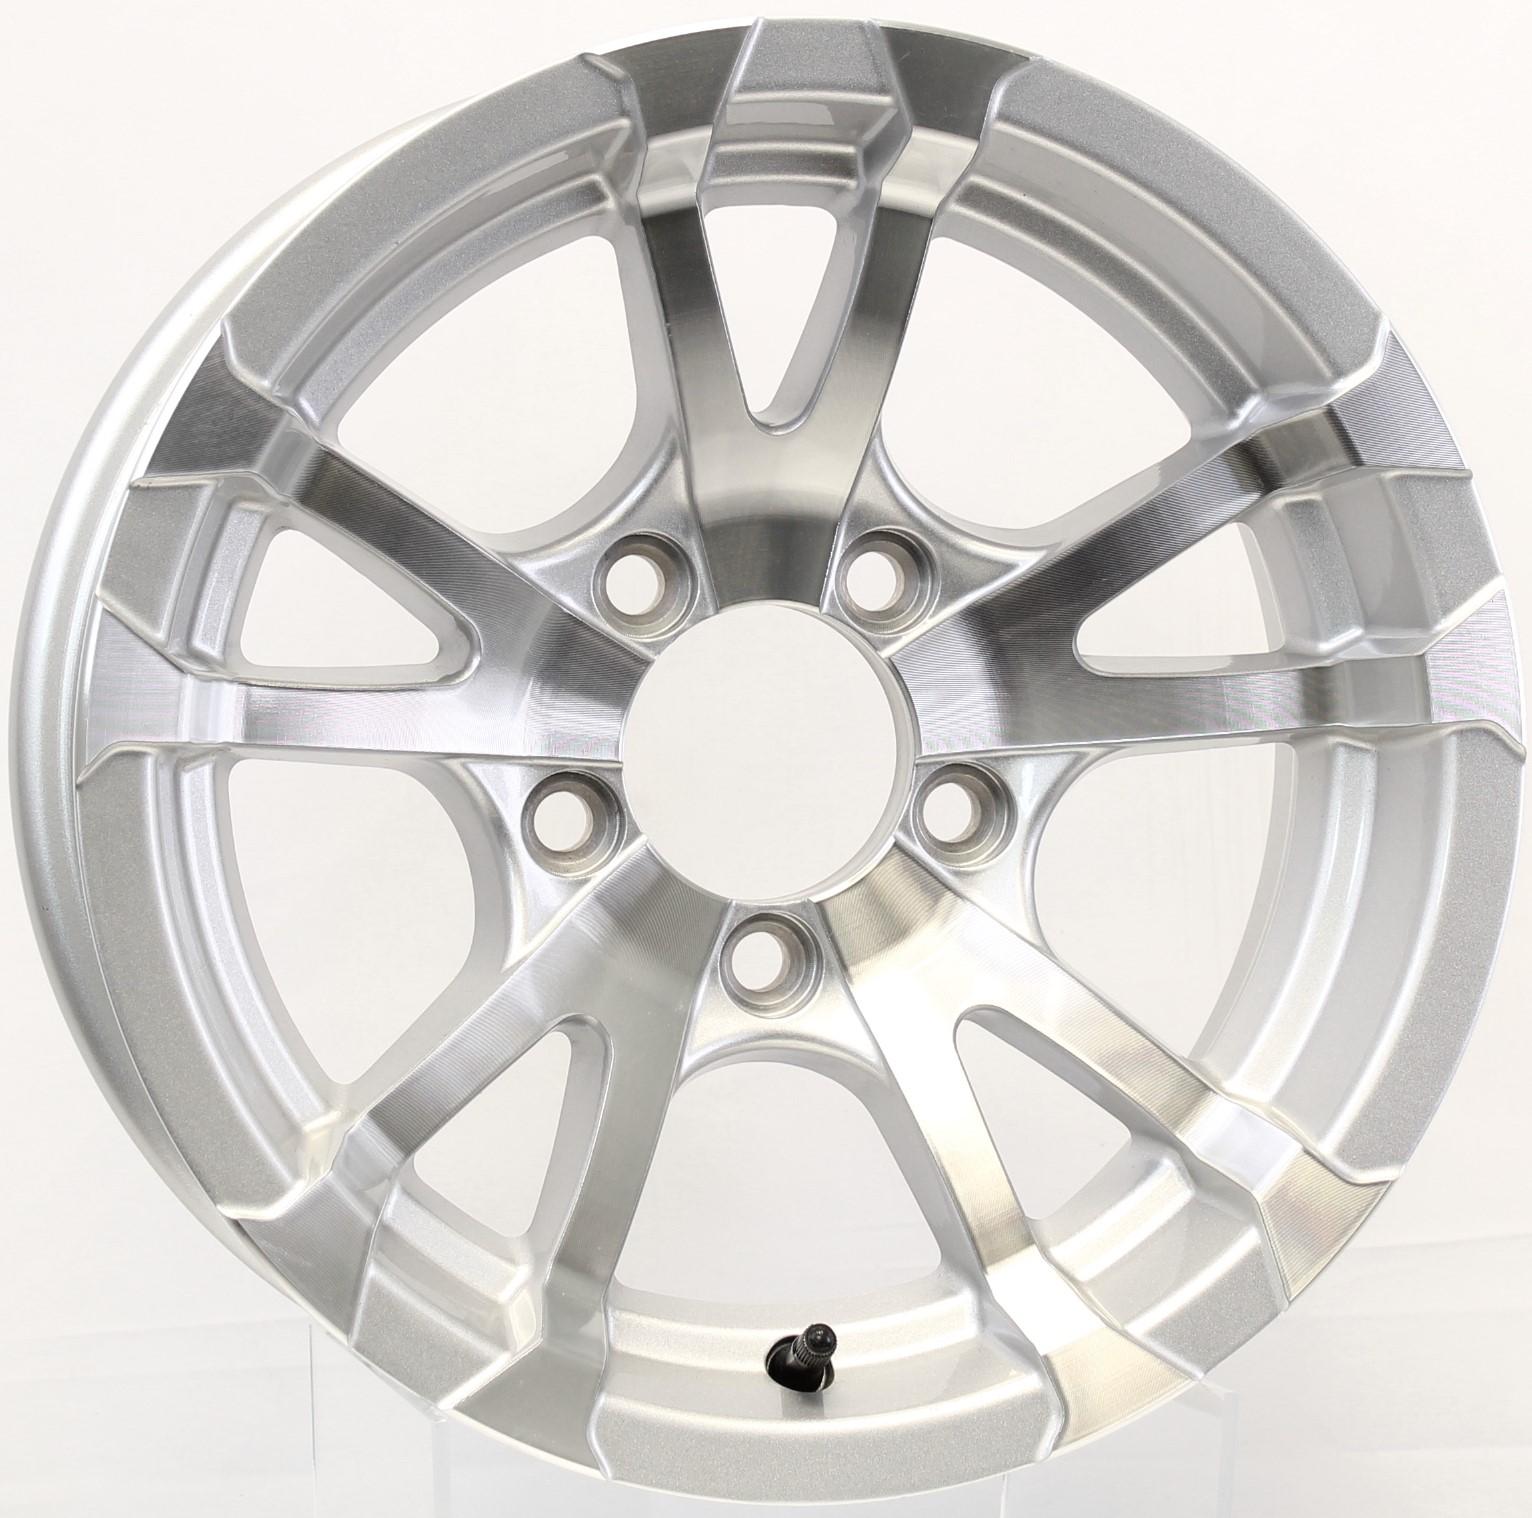 Avalanche- 14x5 5-4.5Silver Aluminum Trailer Wheel Image